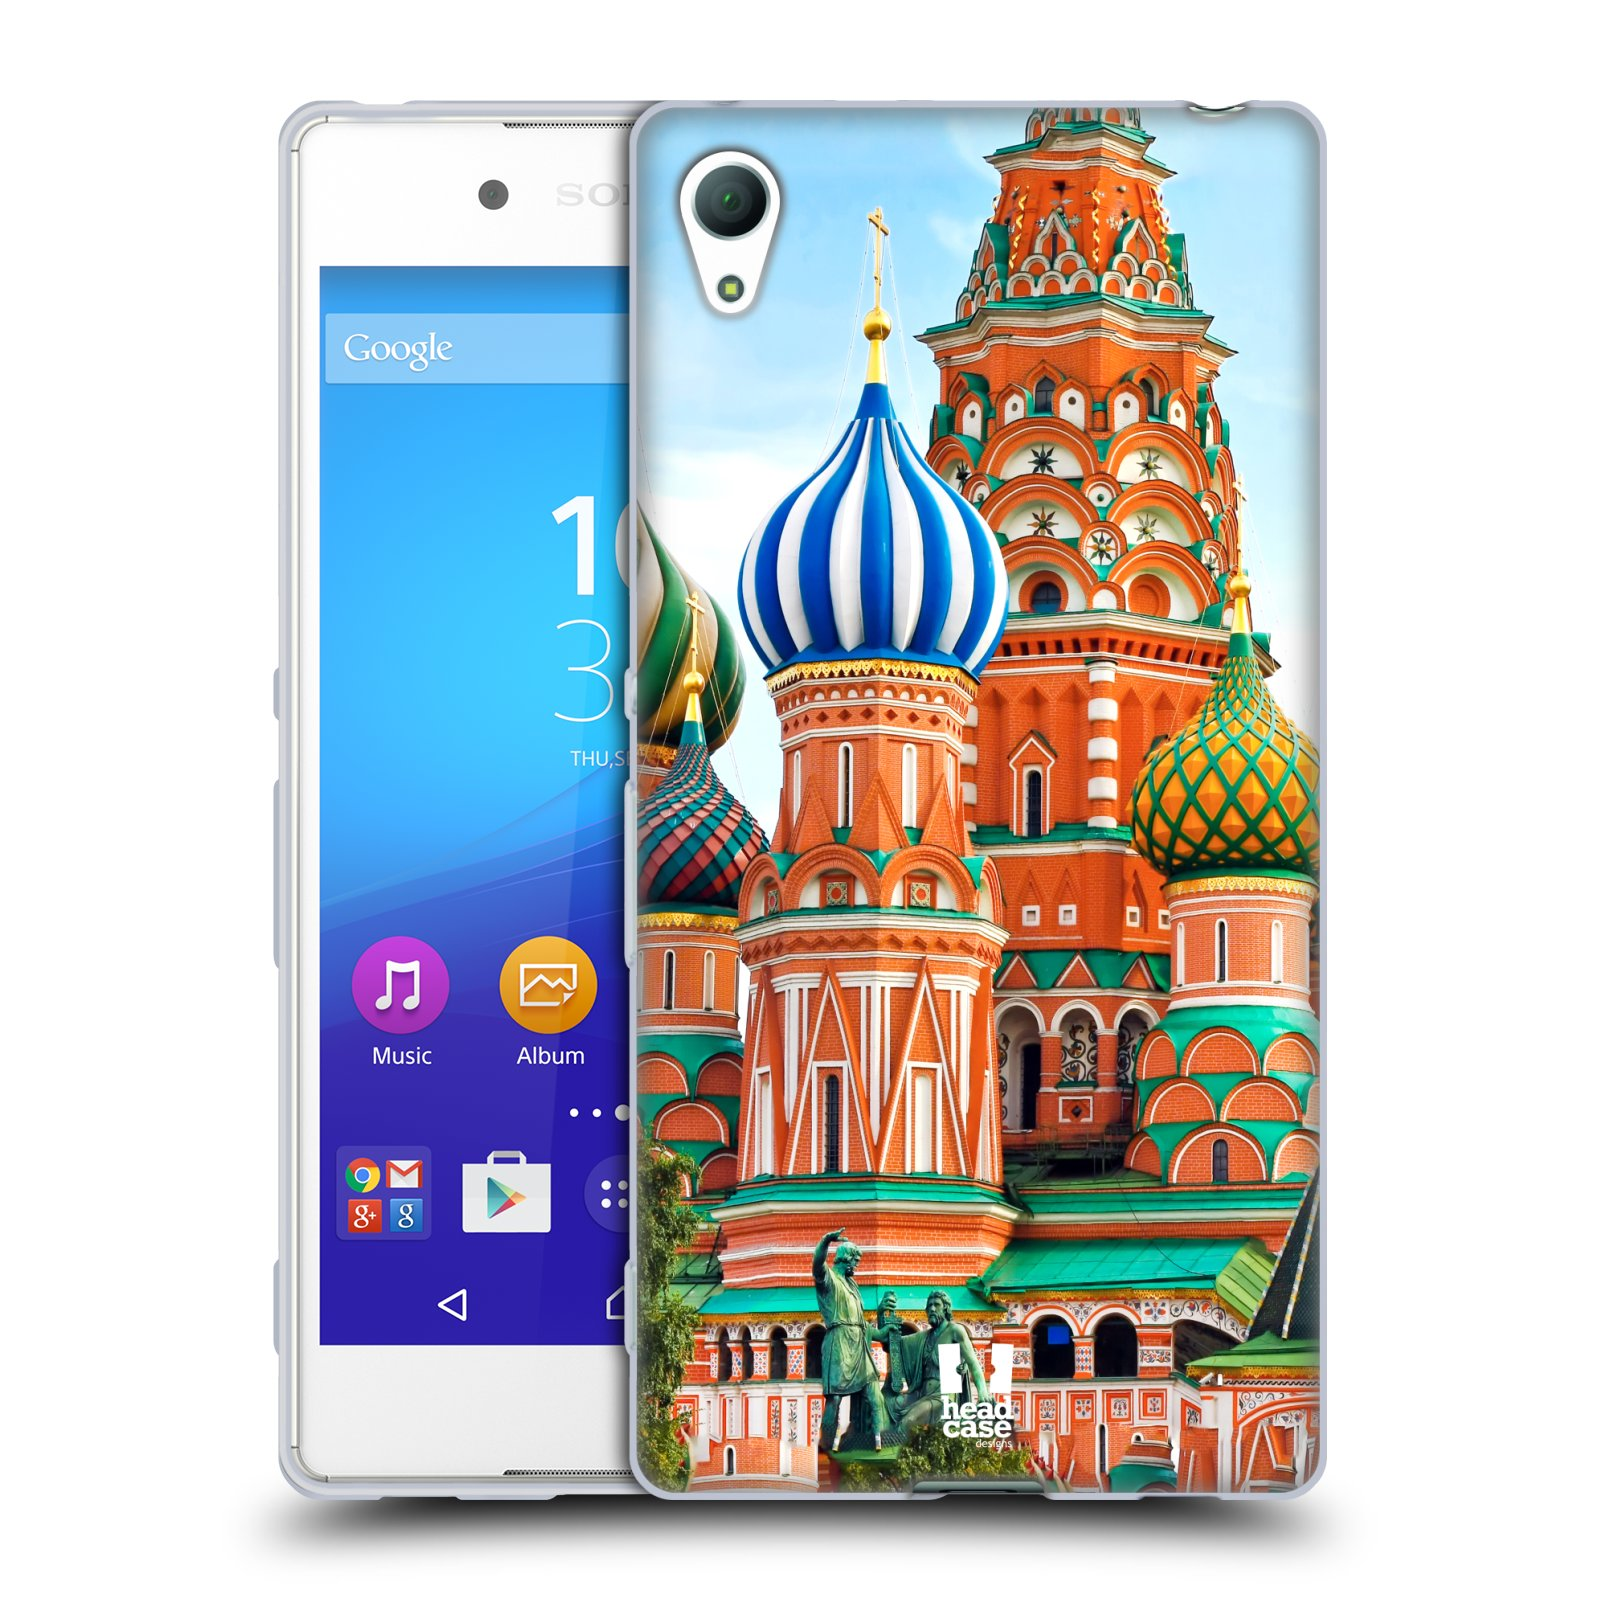 HEAD CASE silikonový obal na mobil Sony Xperia Z3 + (PLUS) vzor Města foto náměstí RUSKO,MOSKVA, RUDÉ NÁMĚSTÍ